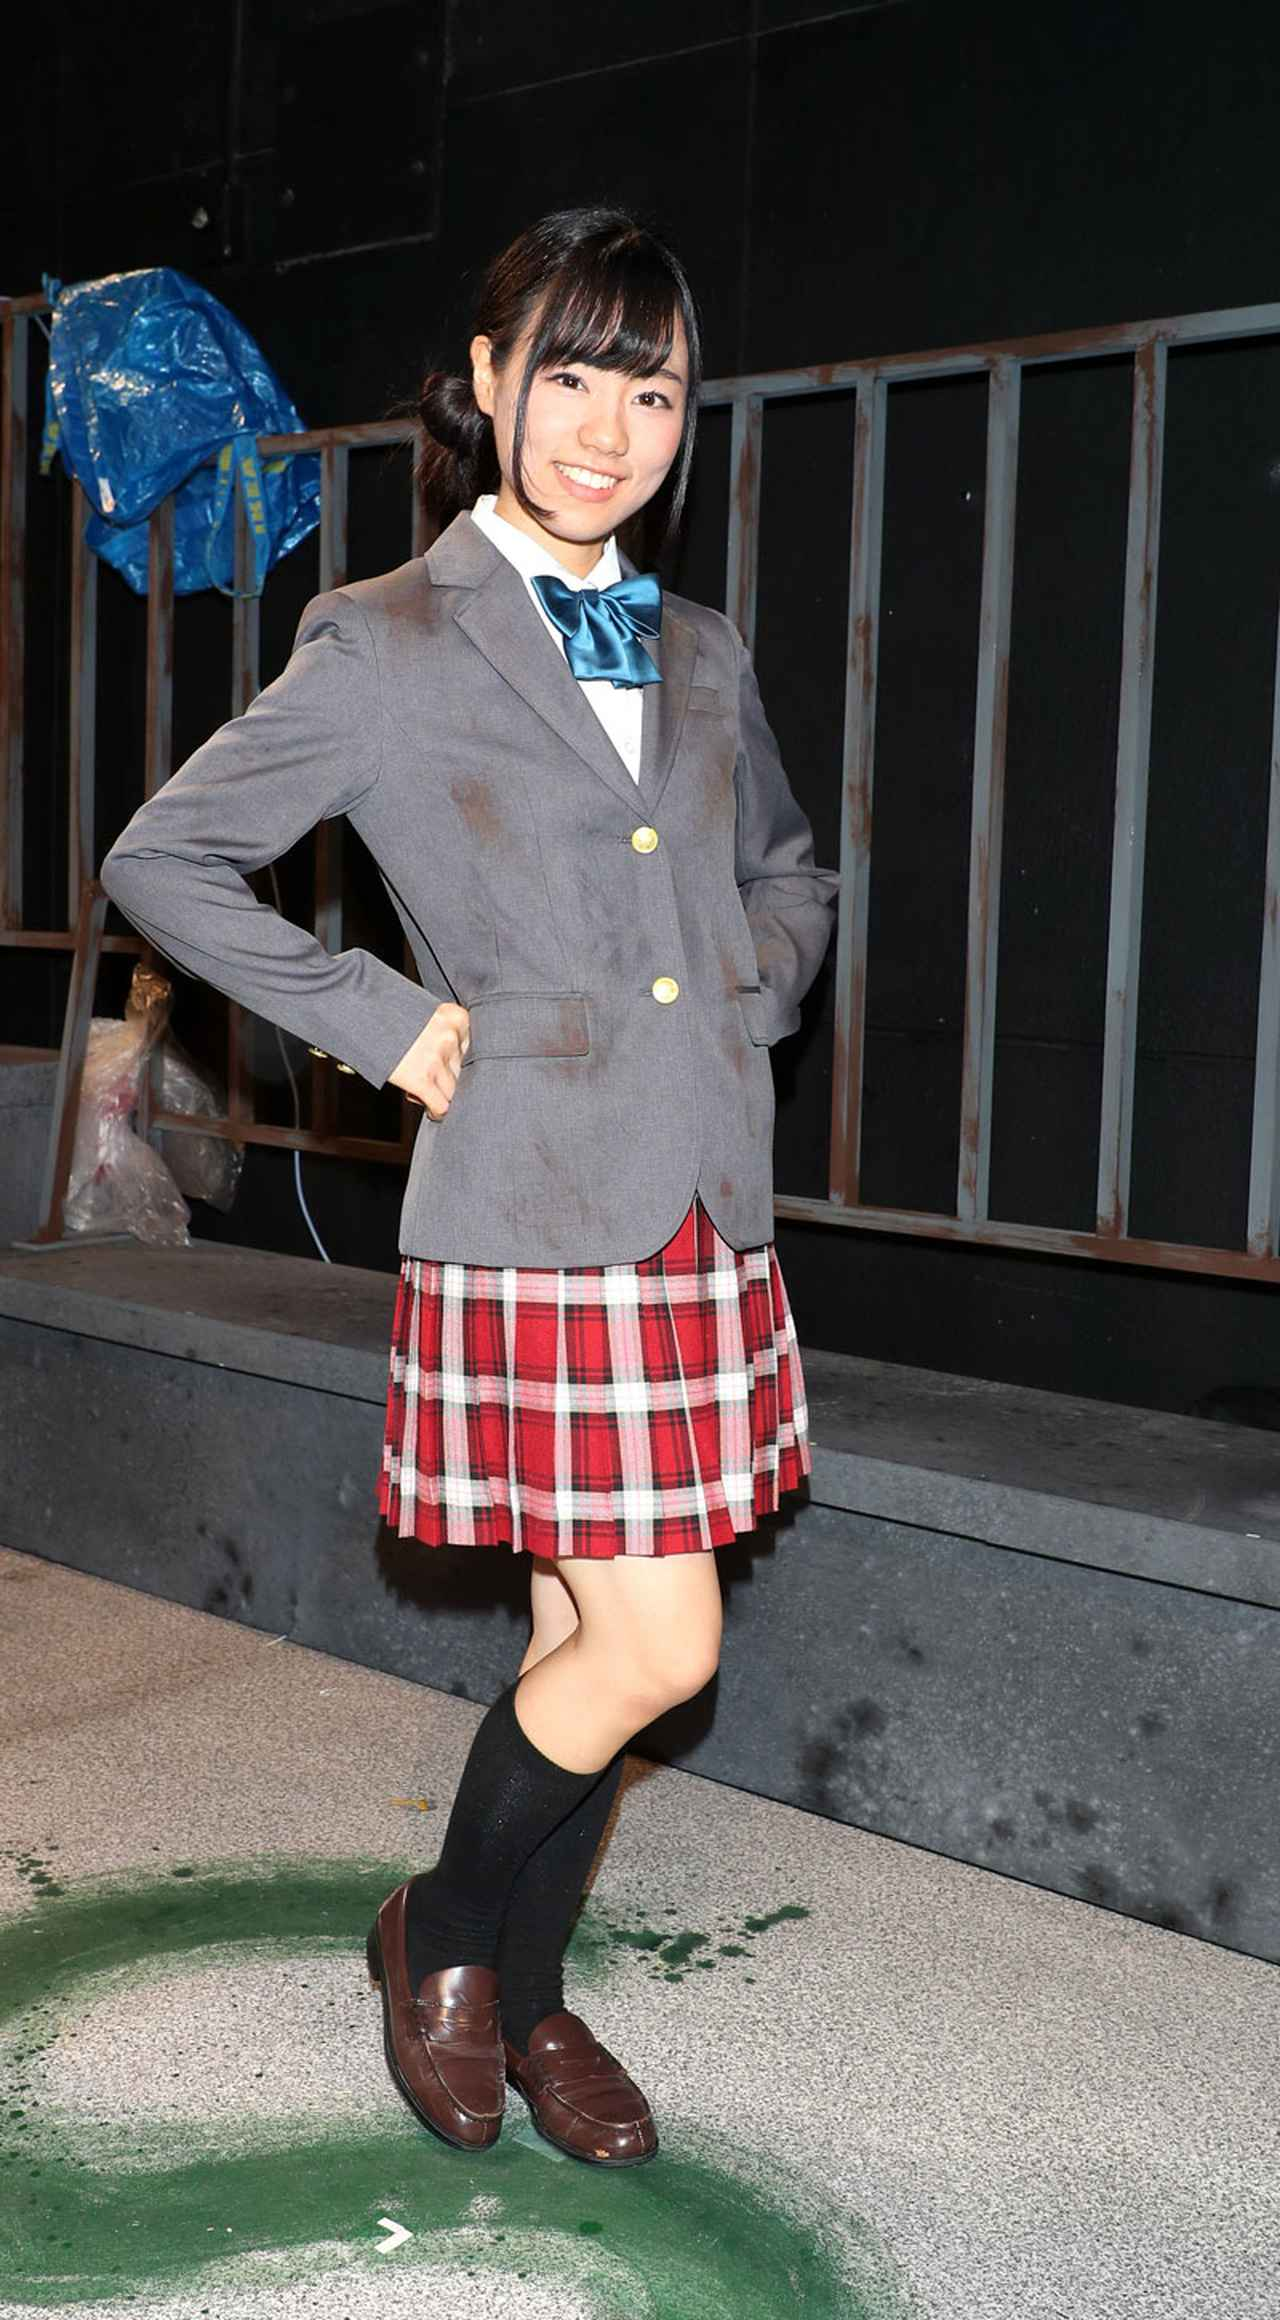 Images : 7番目の画像 - 「花岡芽佳、秋吉あき/アリスインプロジェクト最新作「最果ての星」で可憐な美少女を熱演!」のアルバム - Stereo Sound ONLINE